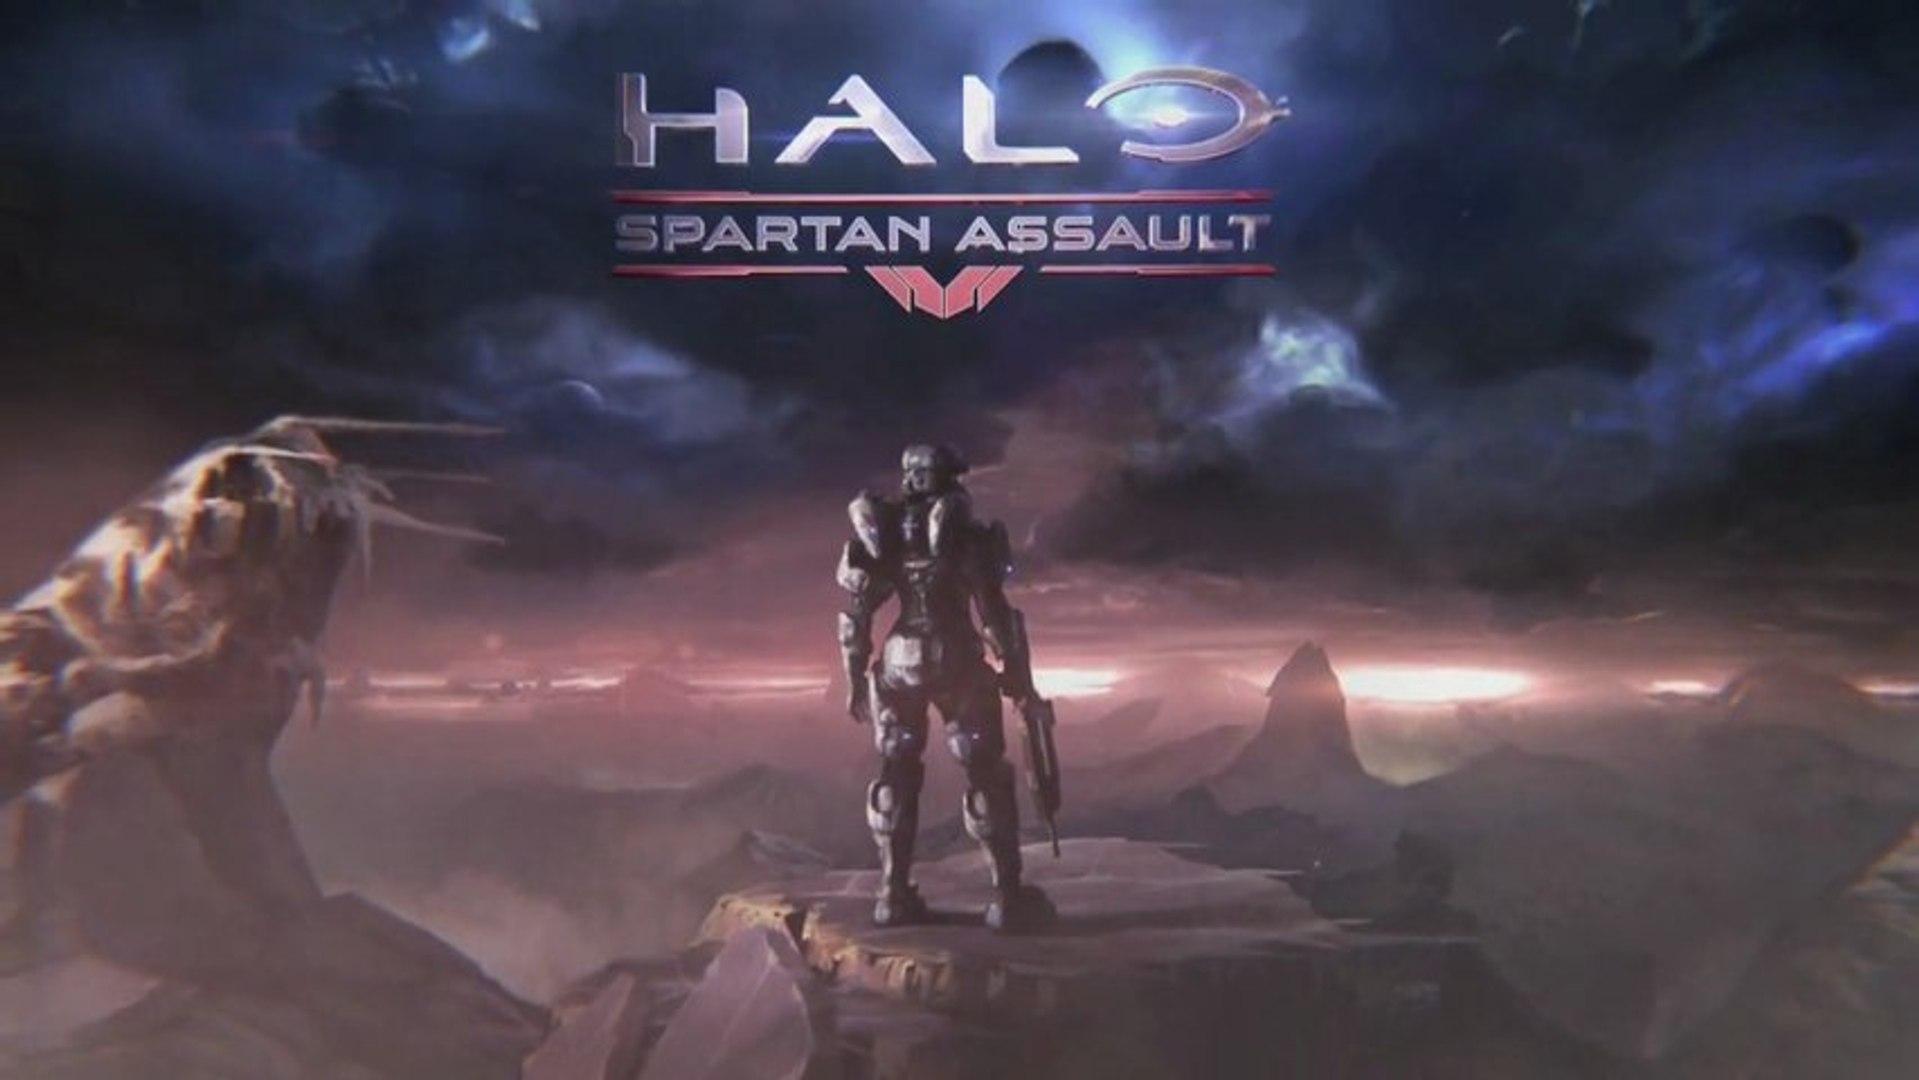 HALO: Spartan Assault | Launch Trailer [EN] (2013) | HD